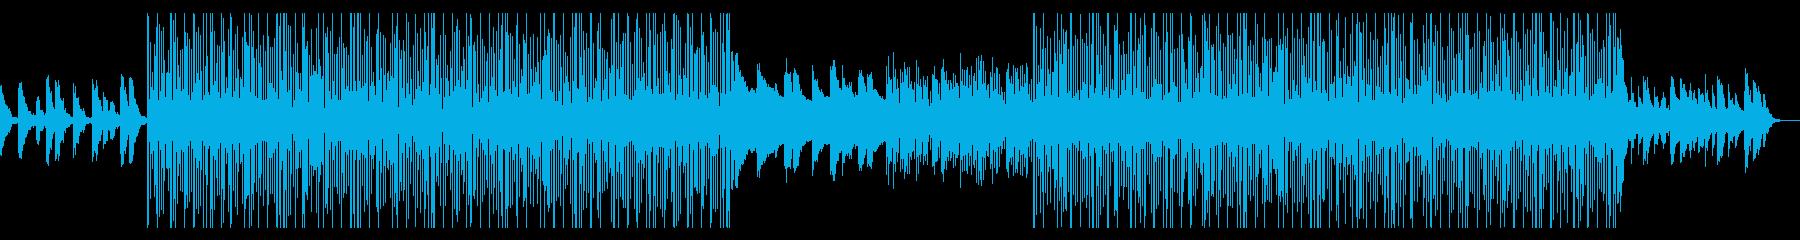 Retrowave Lo-Fi beatの再生済みの波形